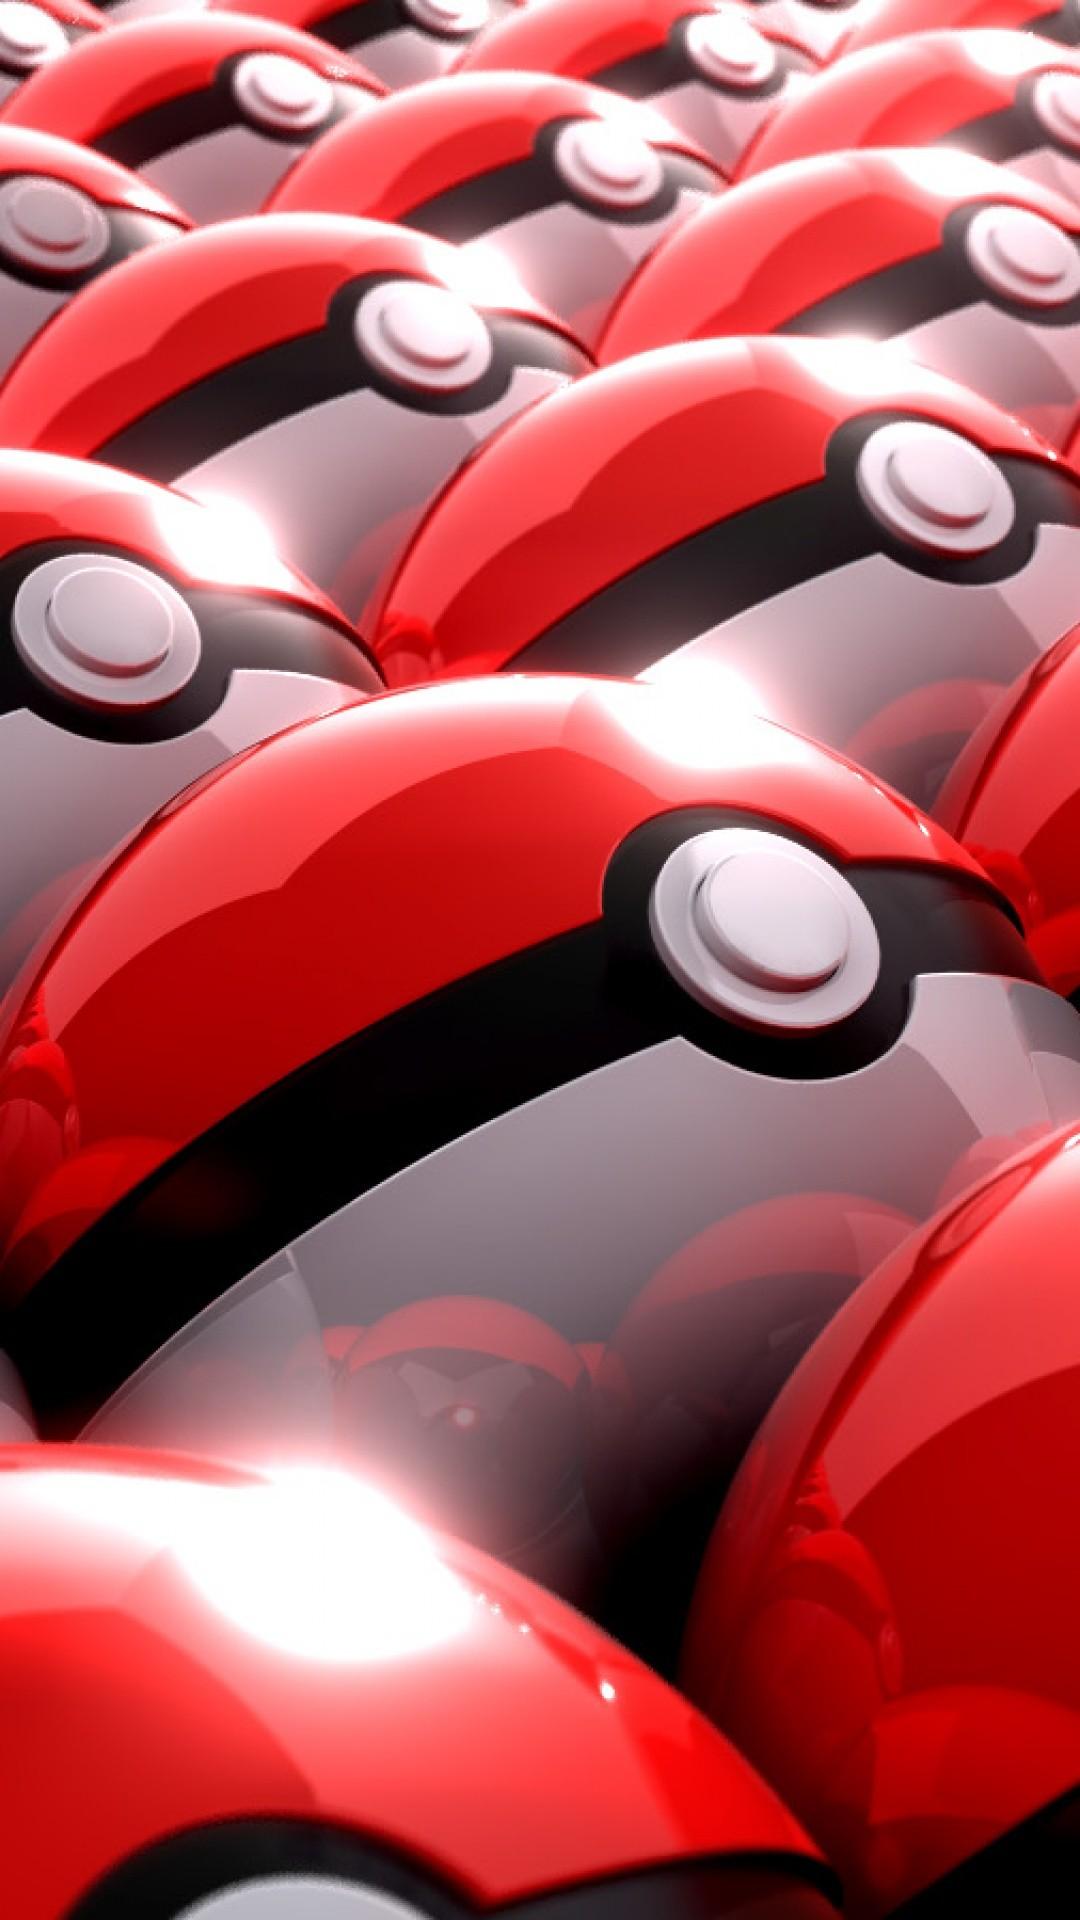 Res: 1080x1920, pokemon-go-mobile-1920×1080-hd-pokeballs-wallpaper-wpt8408010